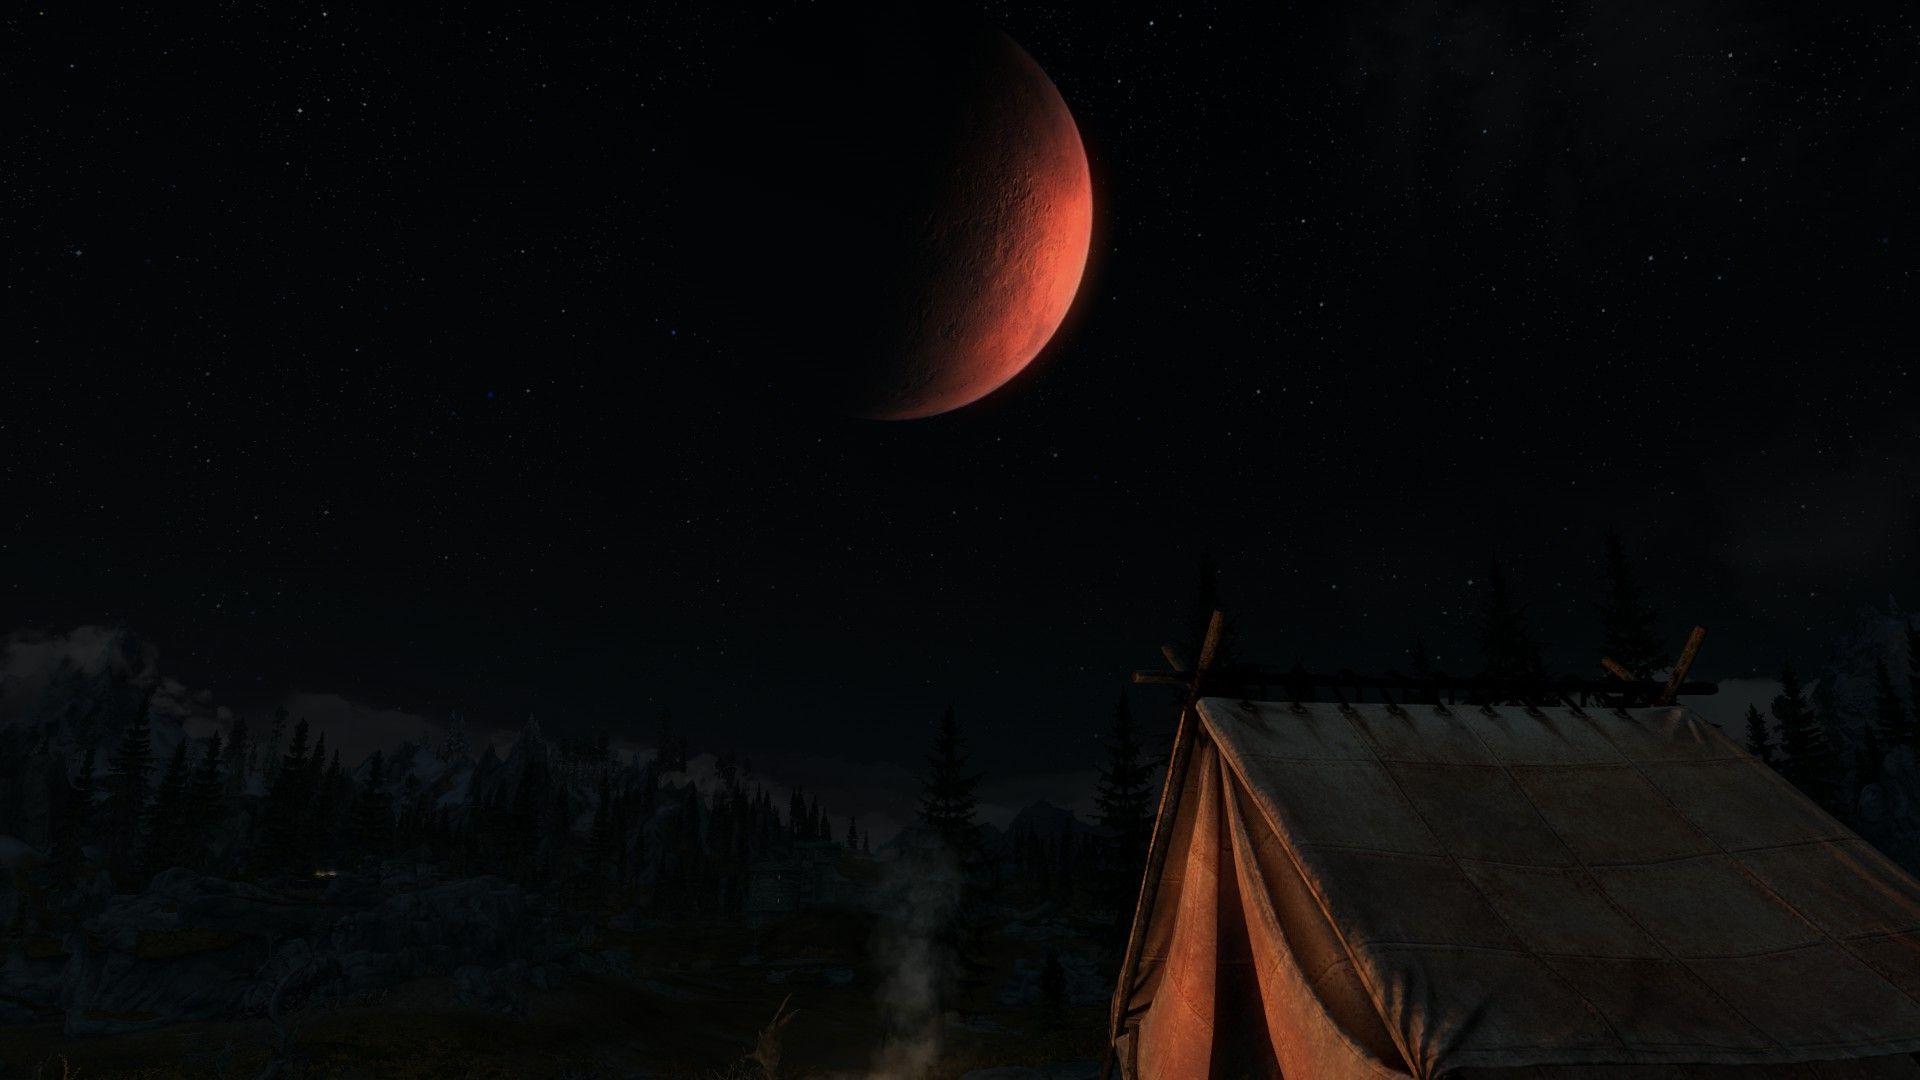 Camping Under Moonlight #games #Skyrim #elderscrolls #BE3 #gaming #videogames #Concours #NGC